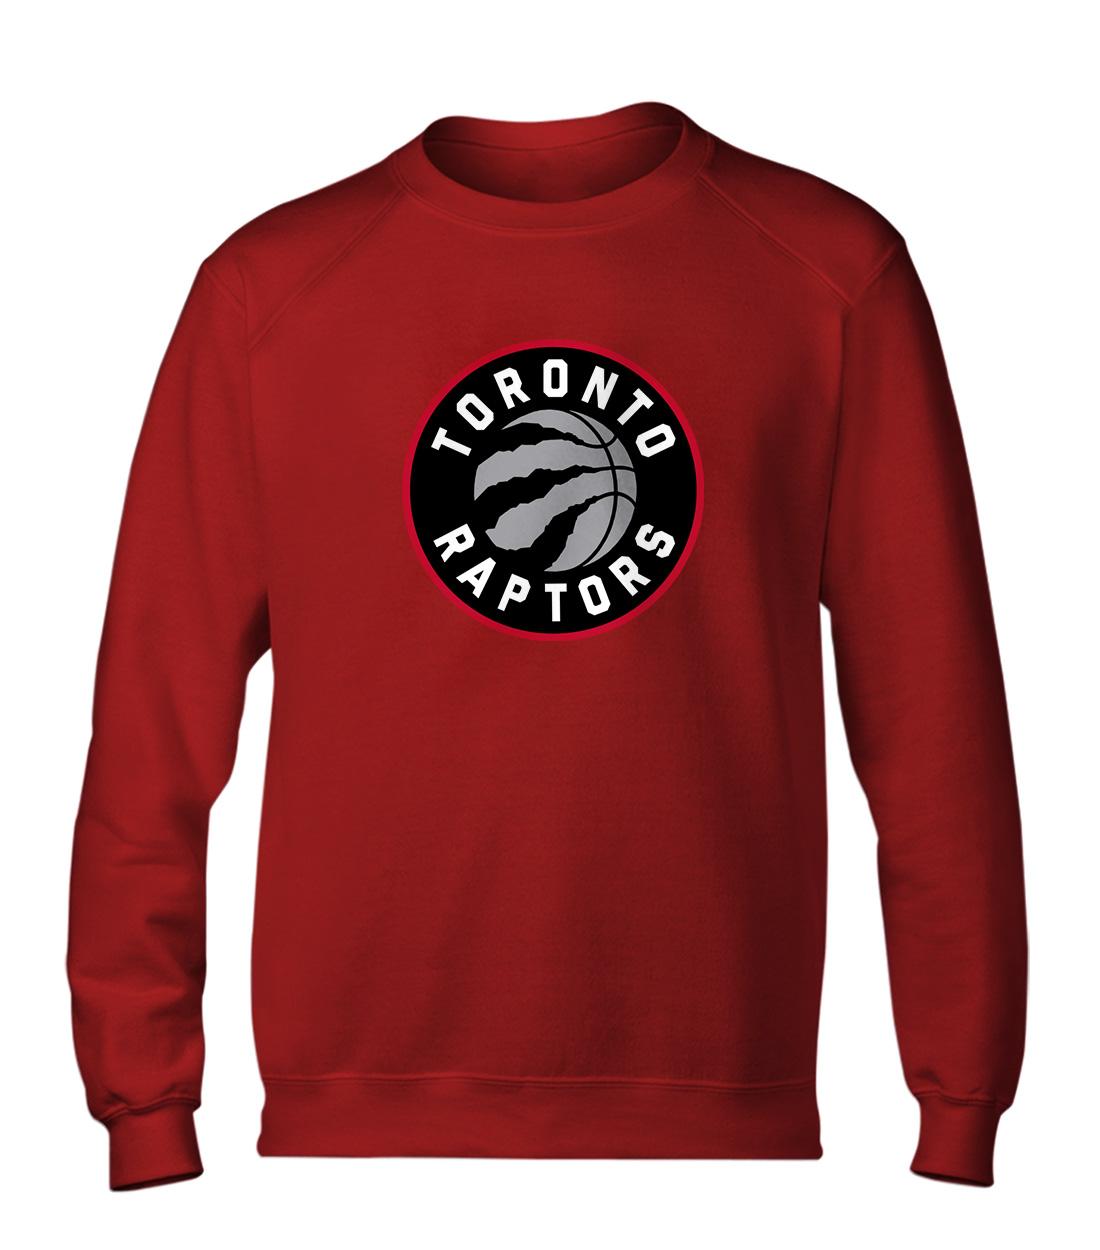 Toronto Raptors Basic (BSC-RED-NP-197-NBA-TOR-LOGO)